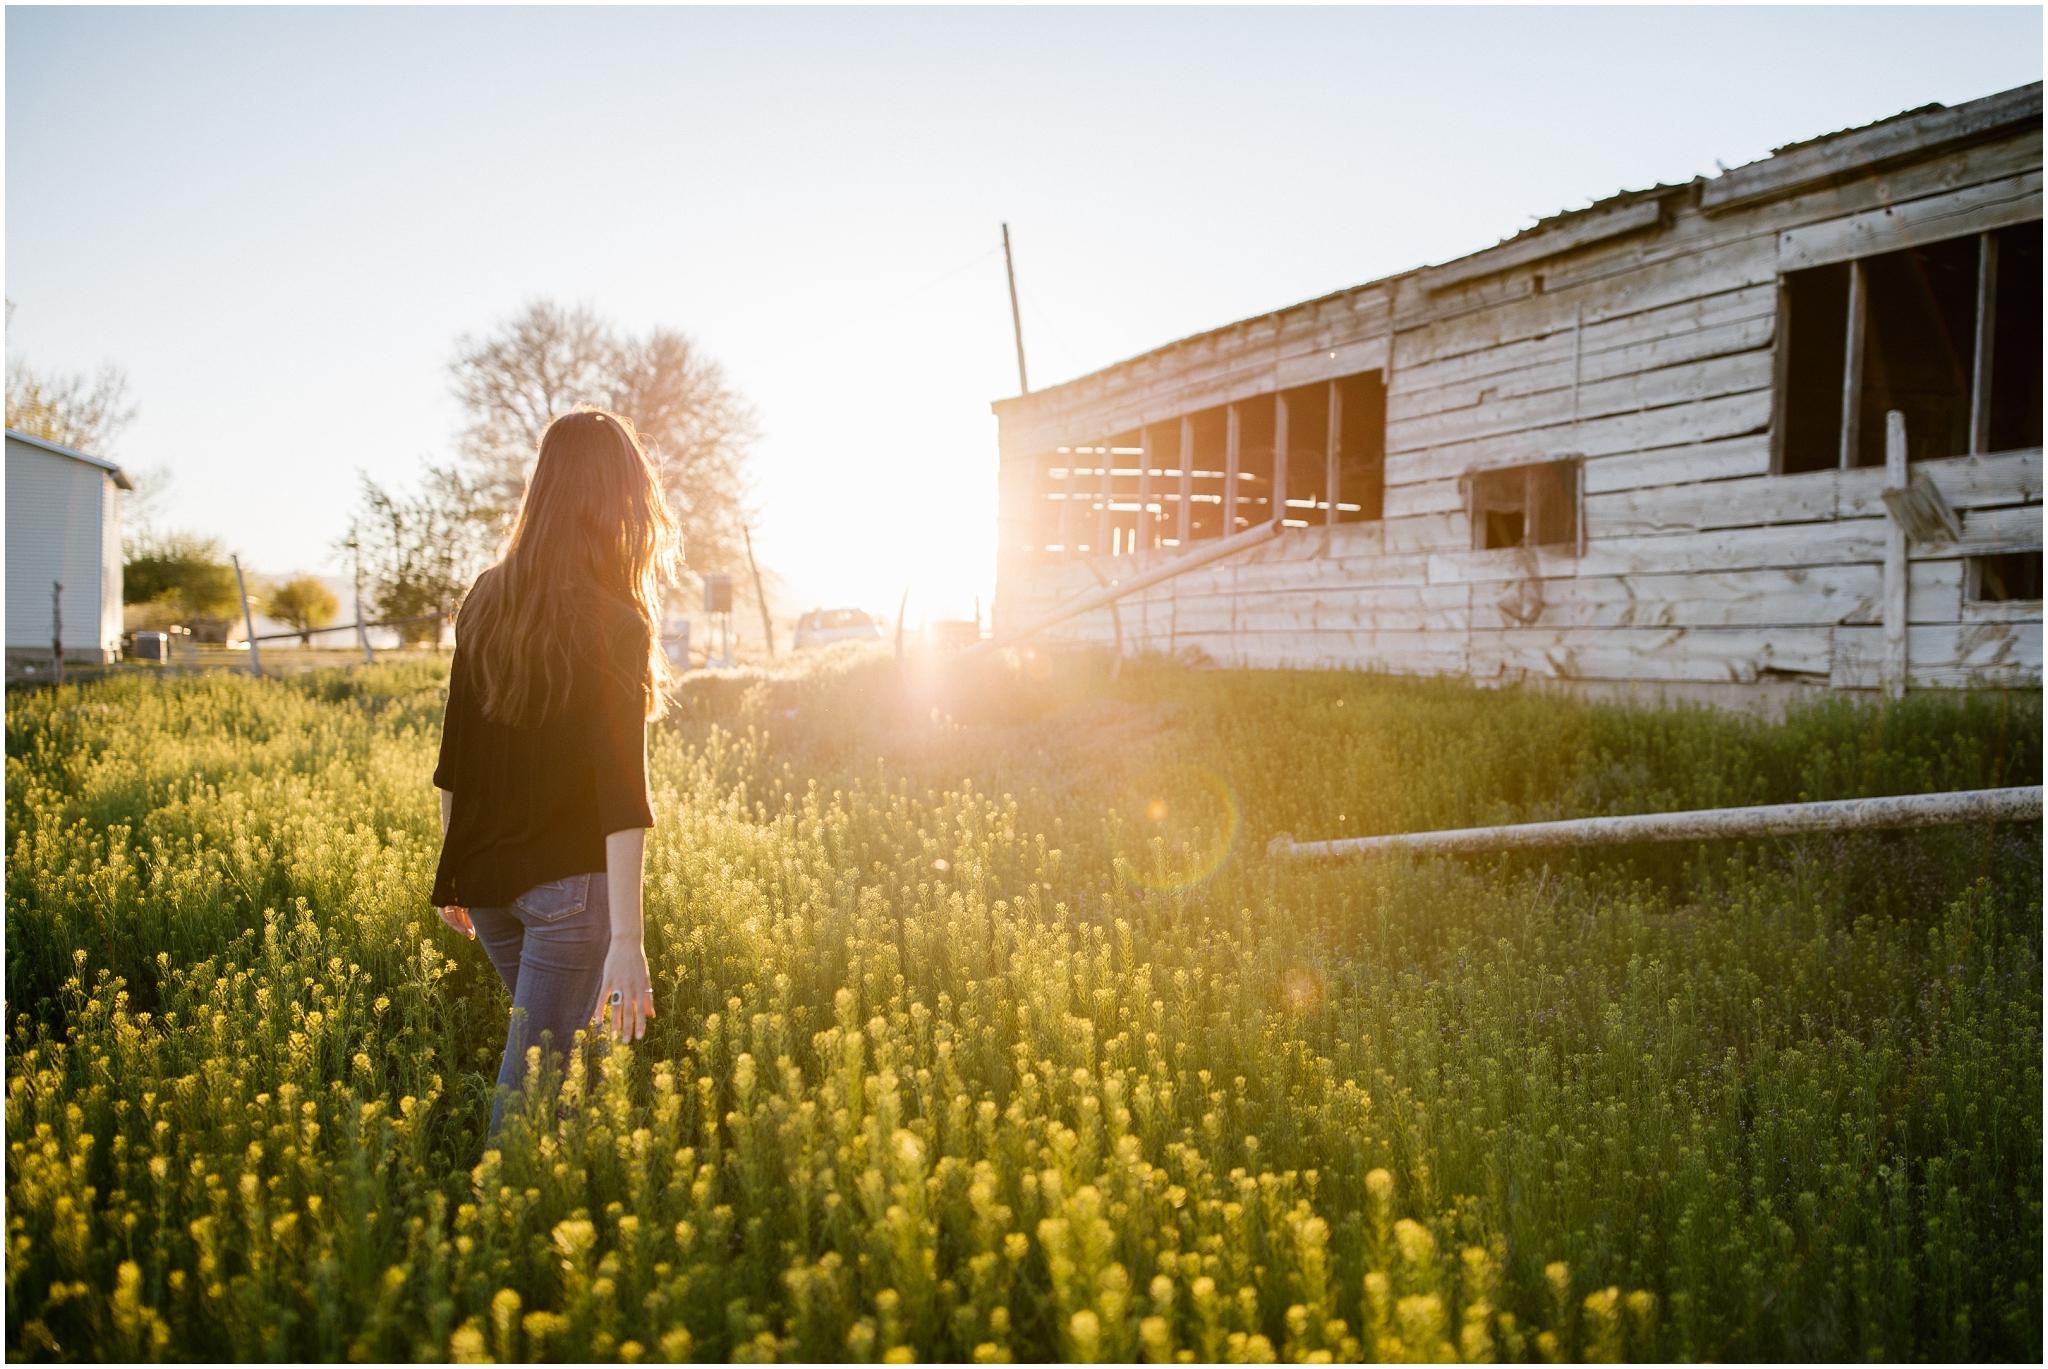 Lizzie-B-Imagery-Utah-Senior-Photographer-Central- Utah-Photographer-Utah-County_0014.jpg